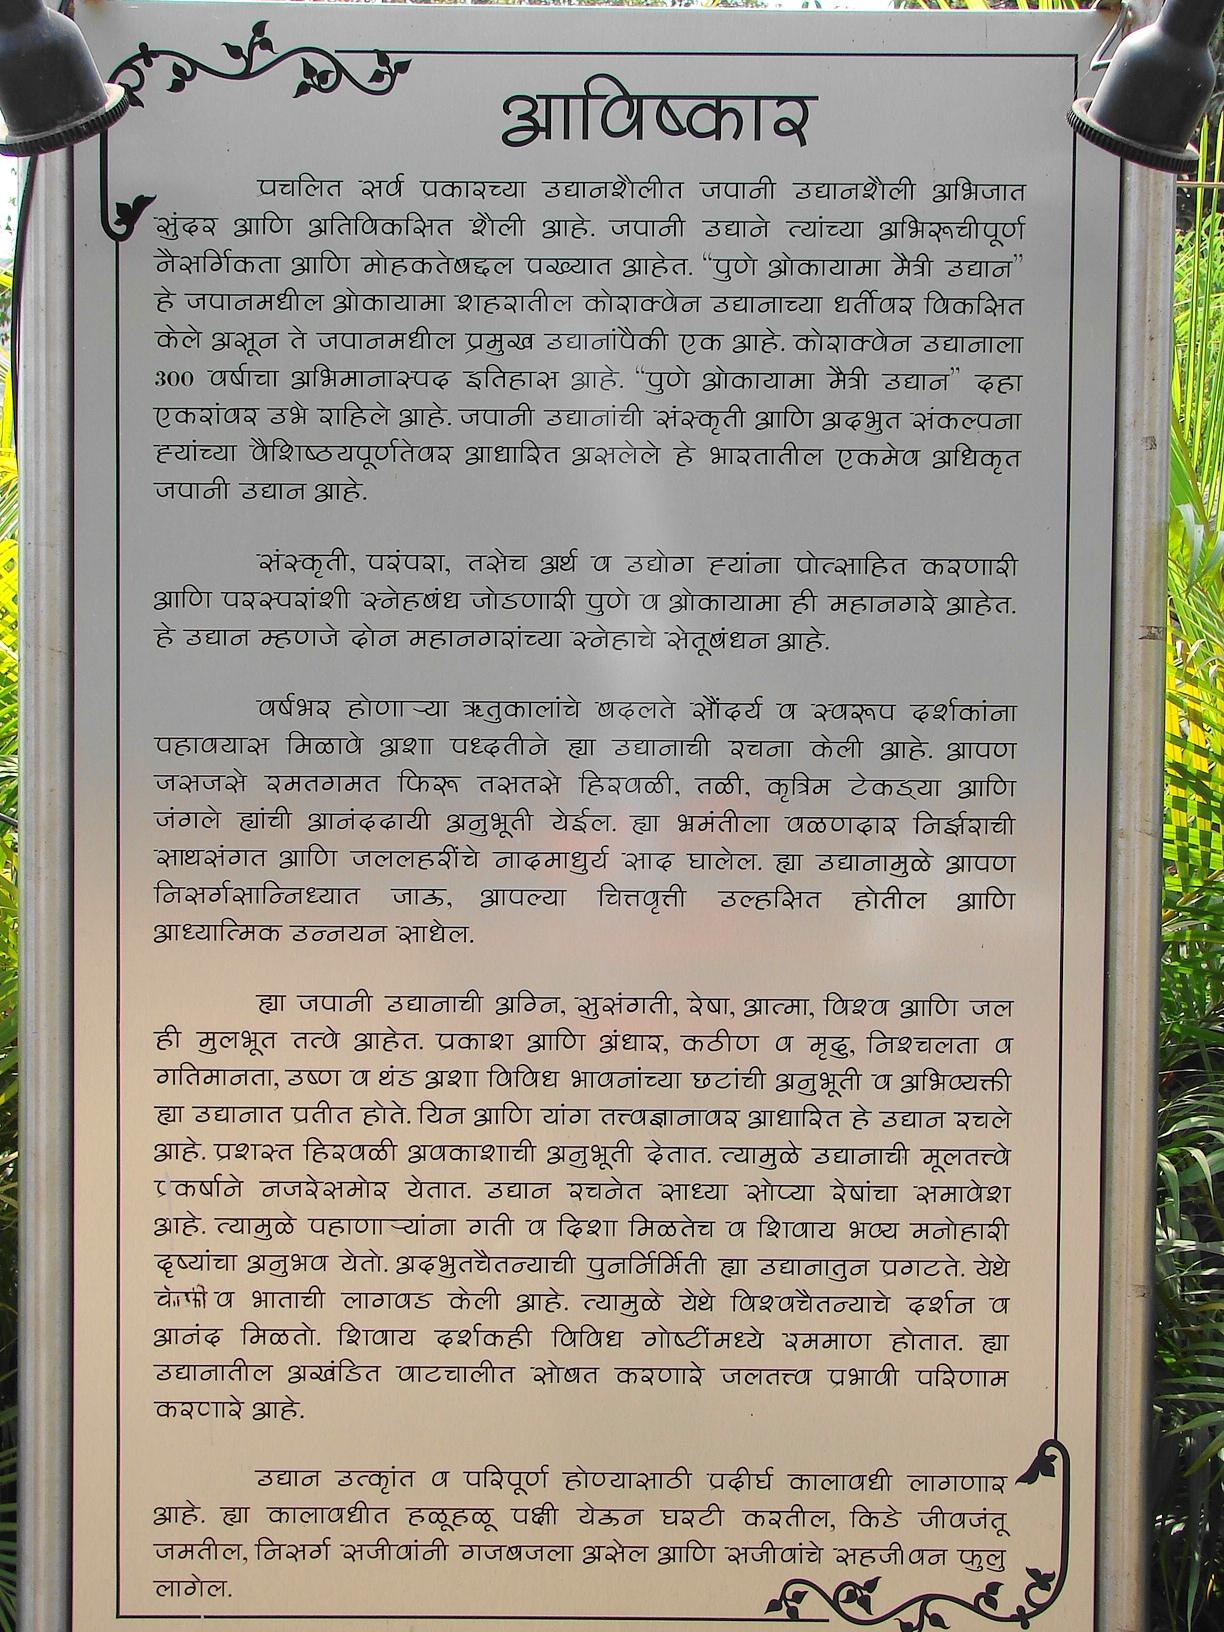 Elegant File:Pu La Deshpande Garden Information.JPG